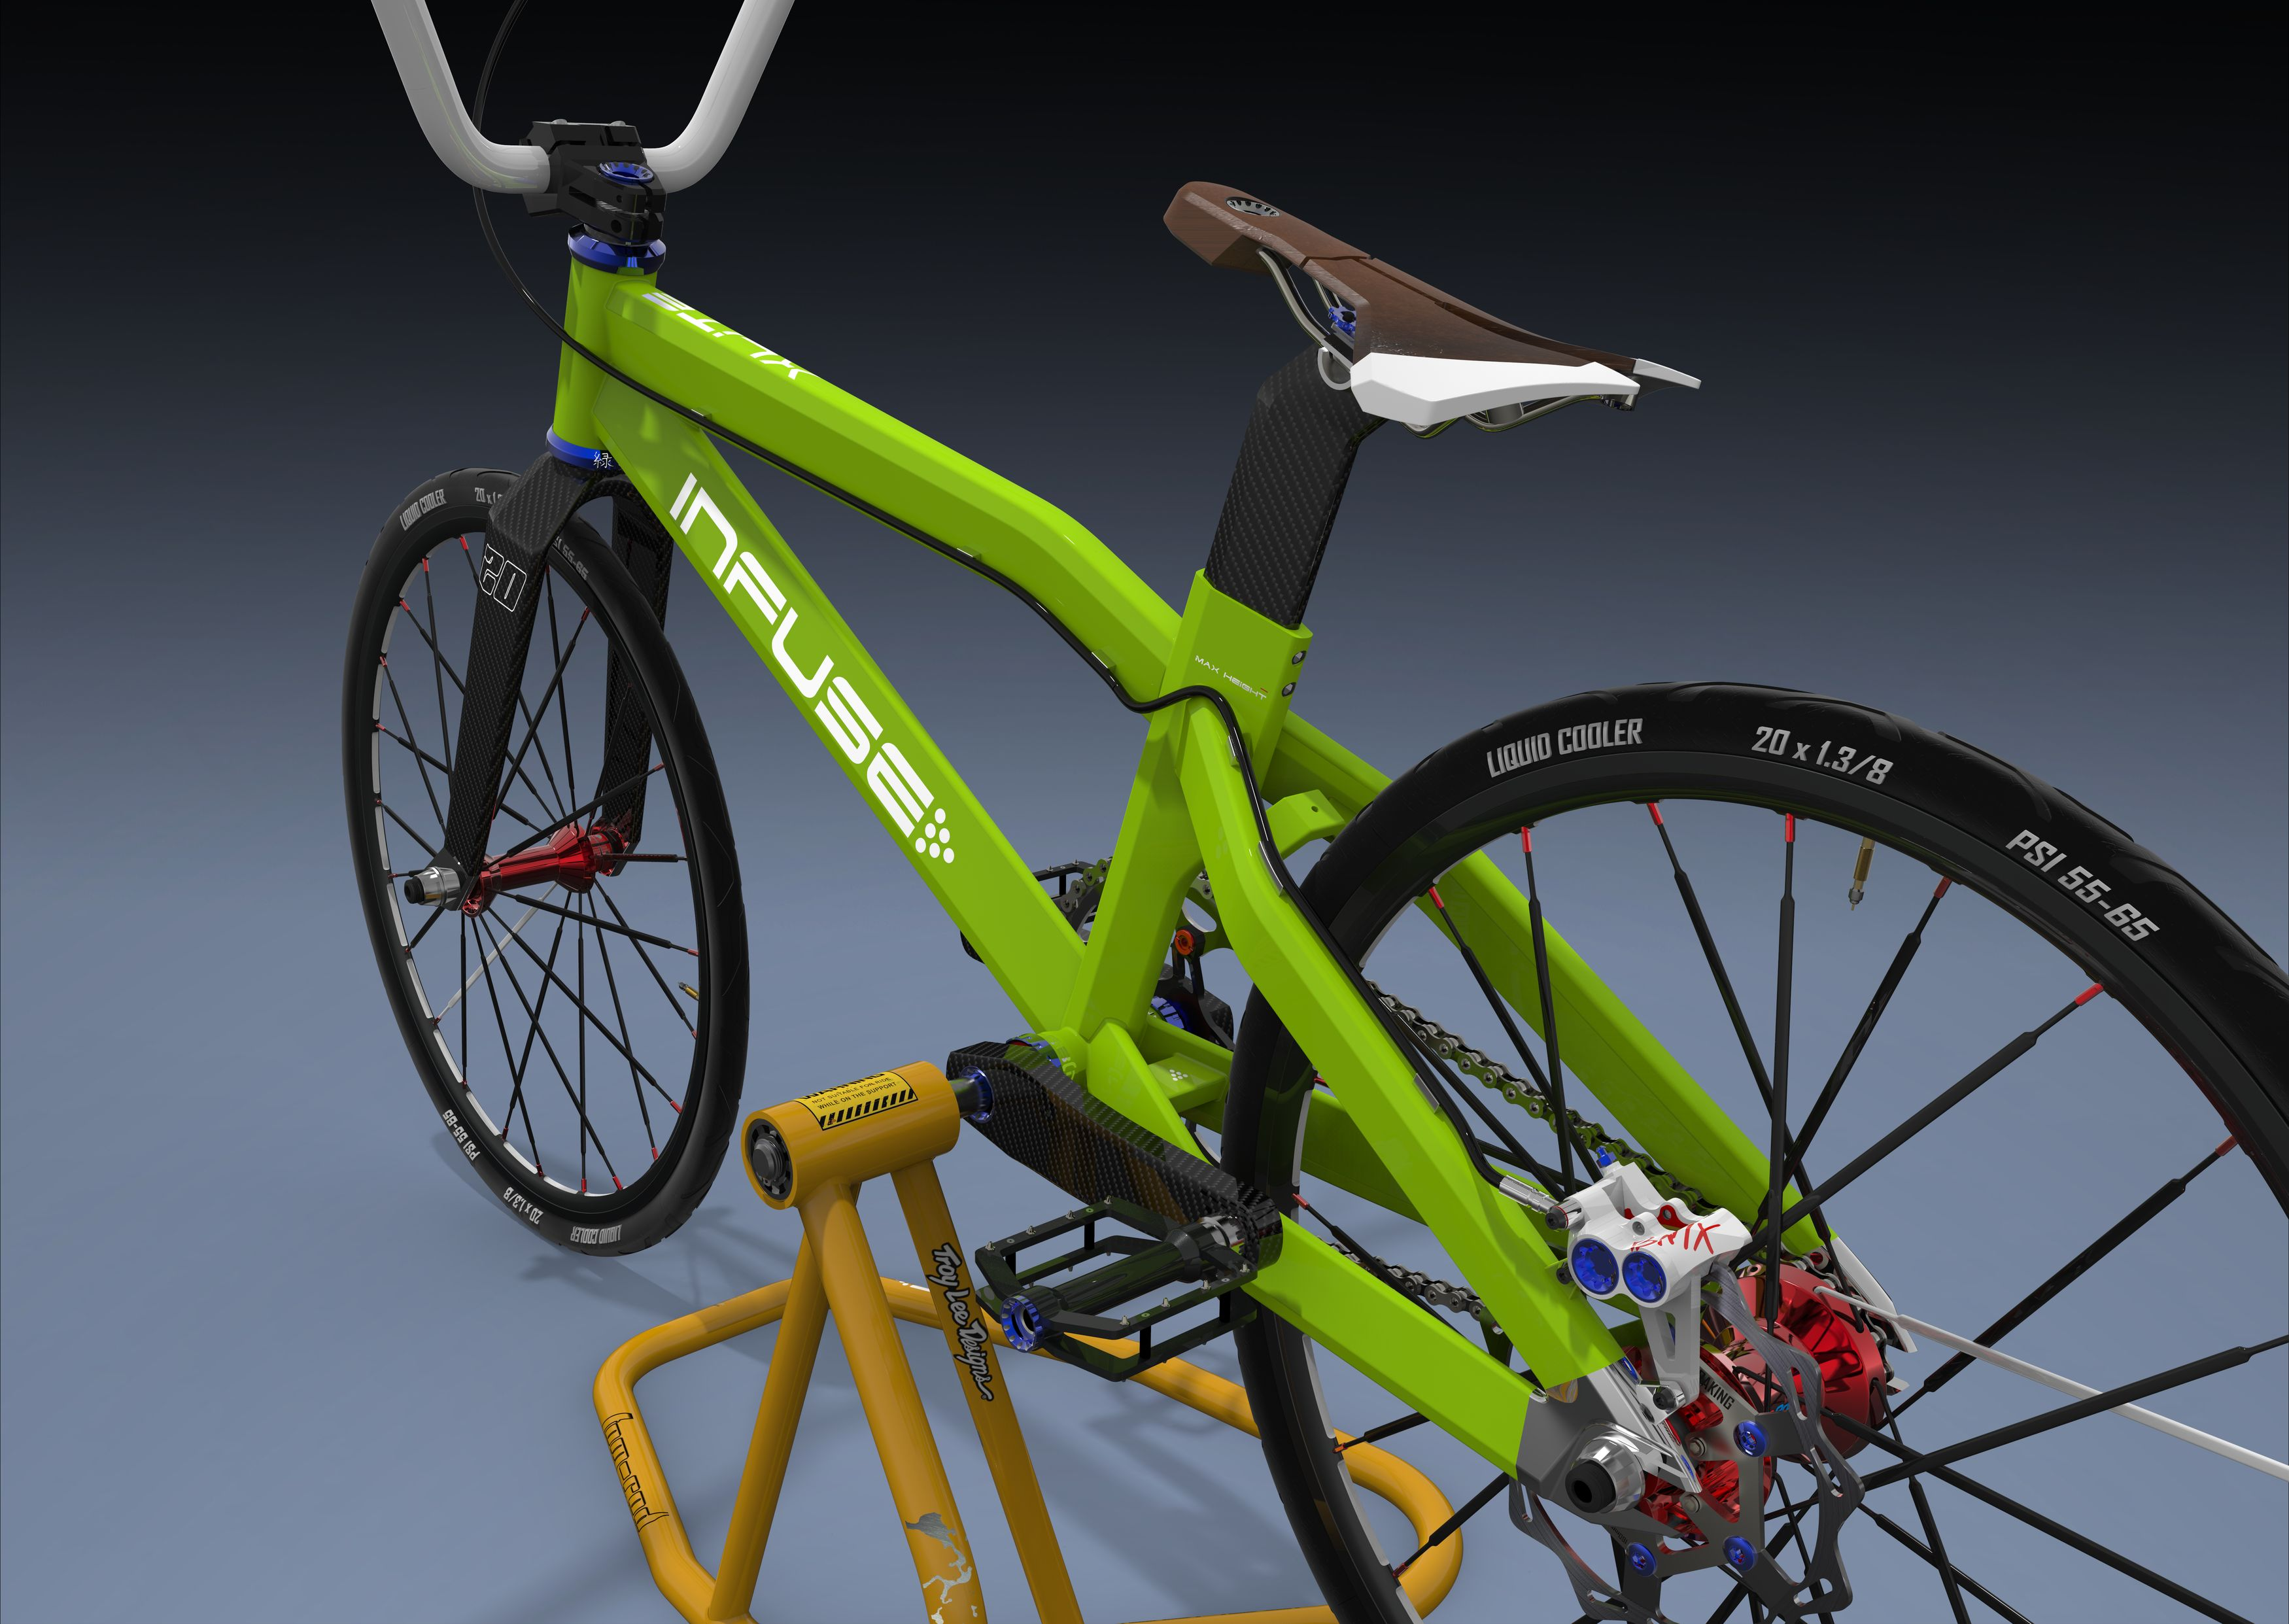 1-bmx-bike-stand-lime-11-3500-3500